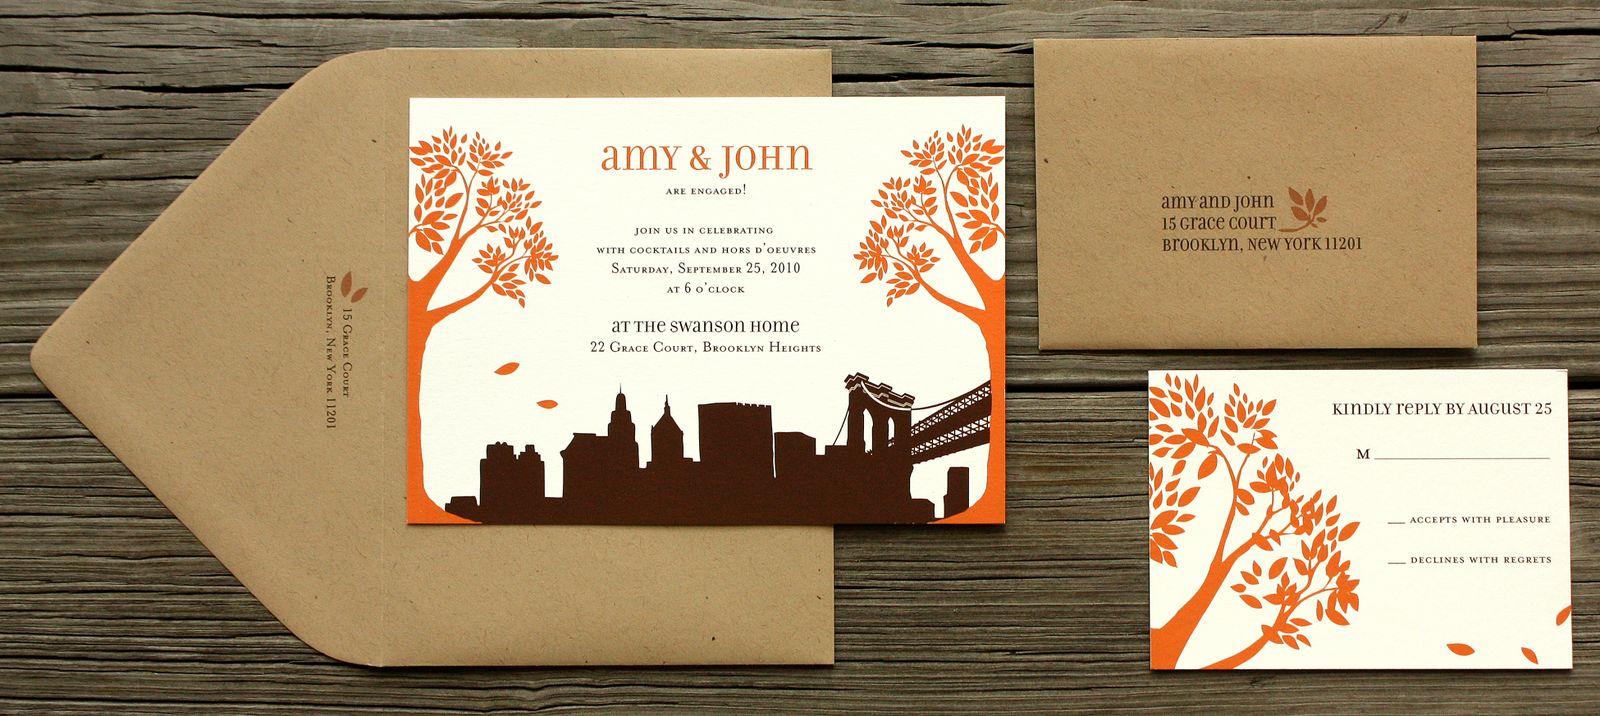 wedding invitations new york city - broprahshow, Wedding invitations